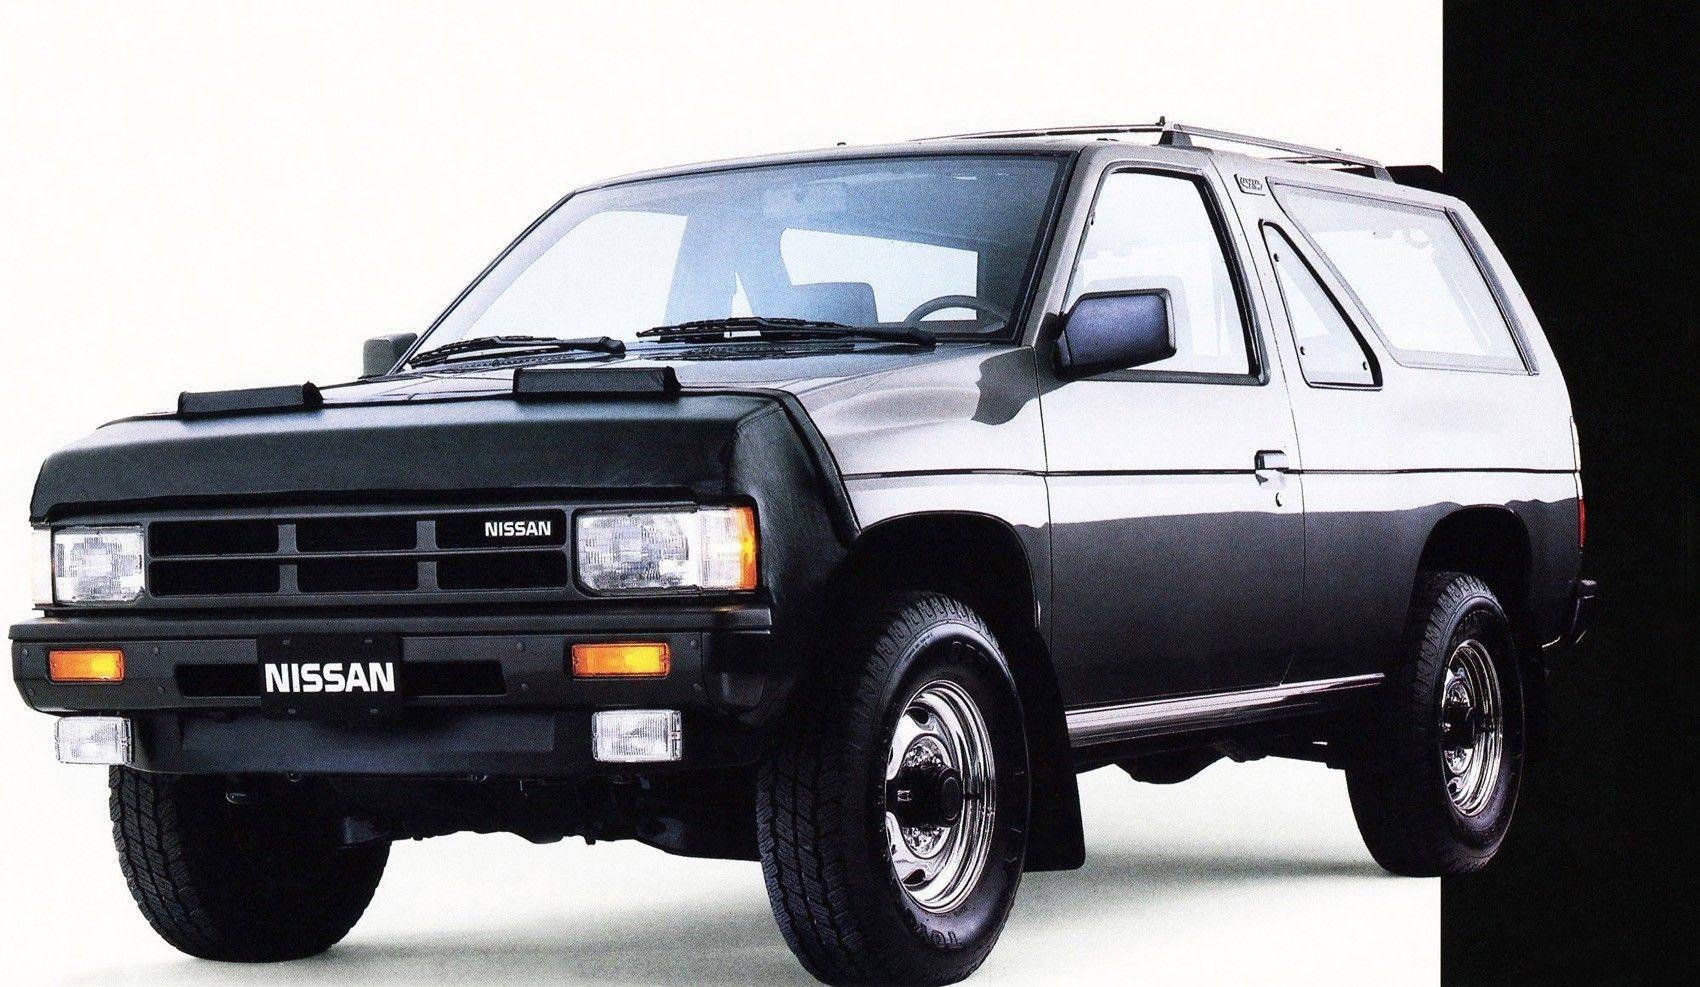 Nissan Pathfinder 2 Door North America Wd21 04 1985 92 Nissan Terrano Nissan Pathfinder Nissan